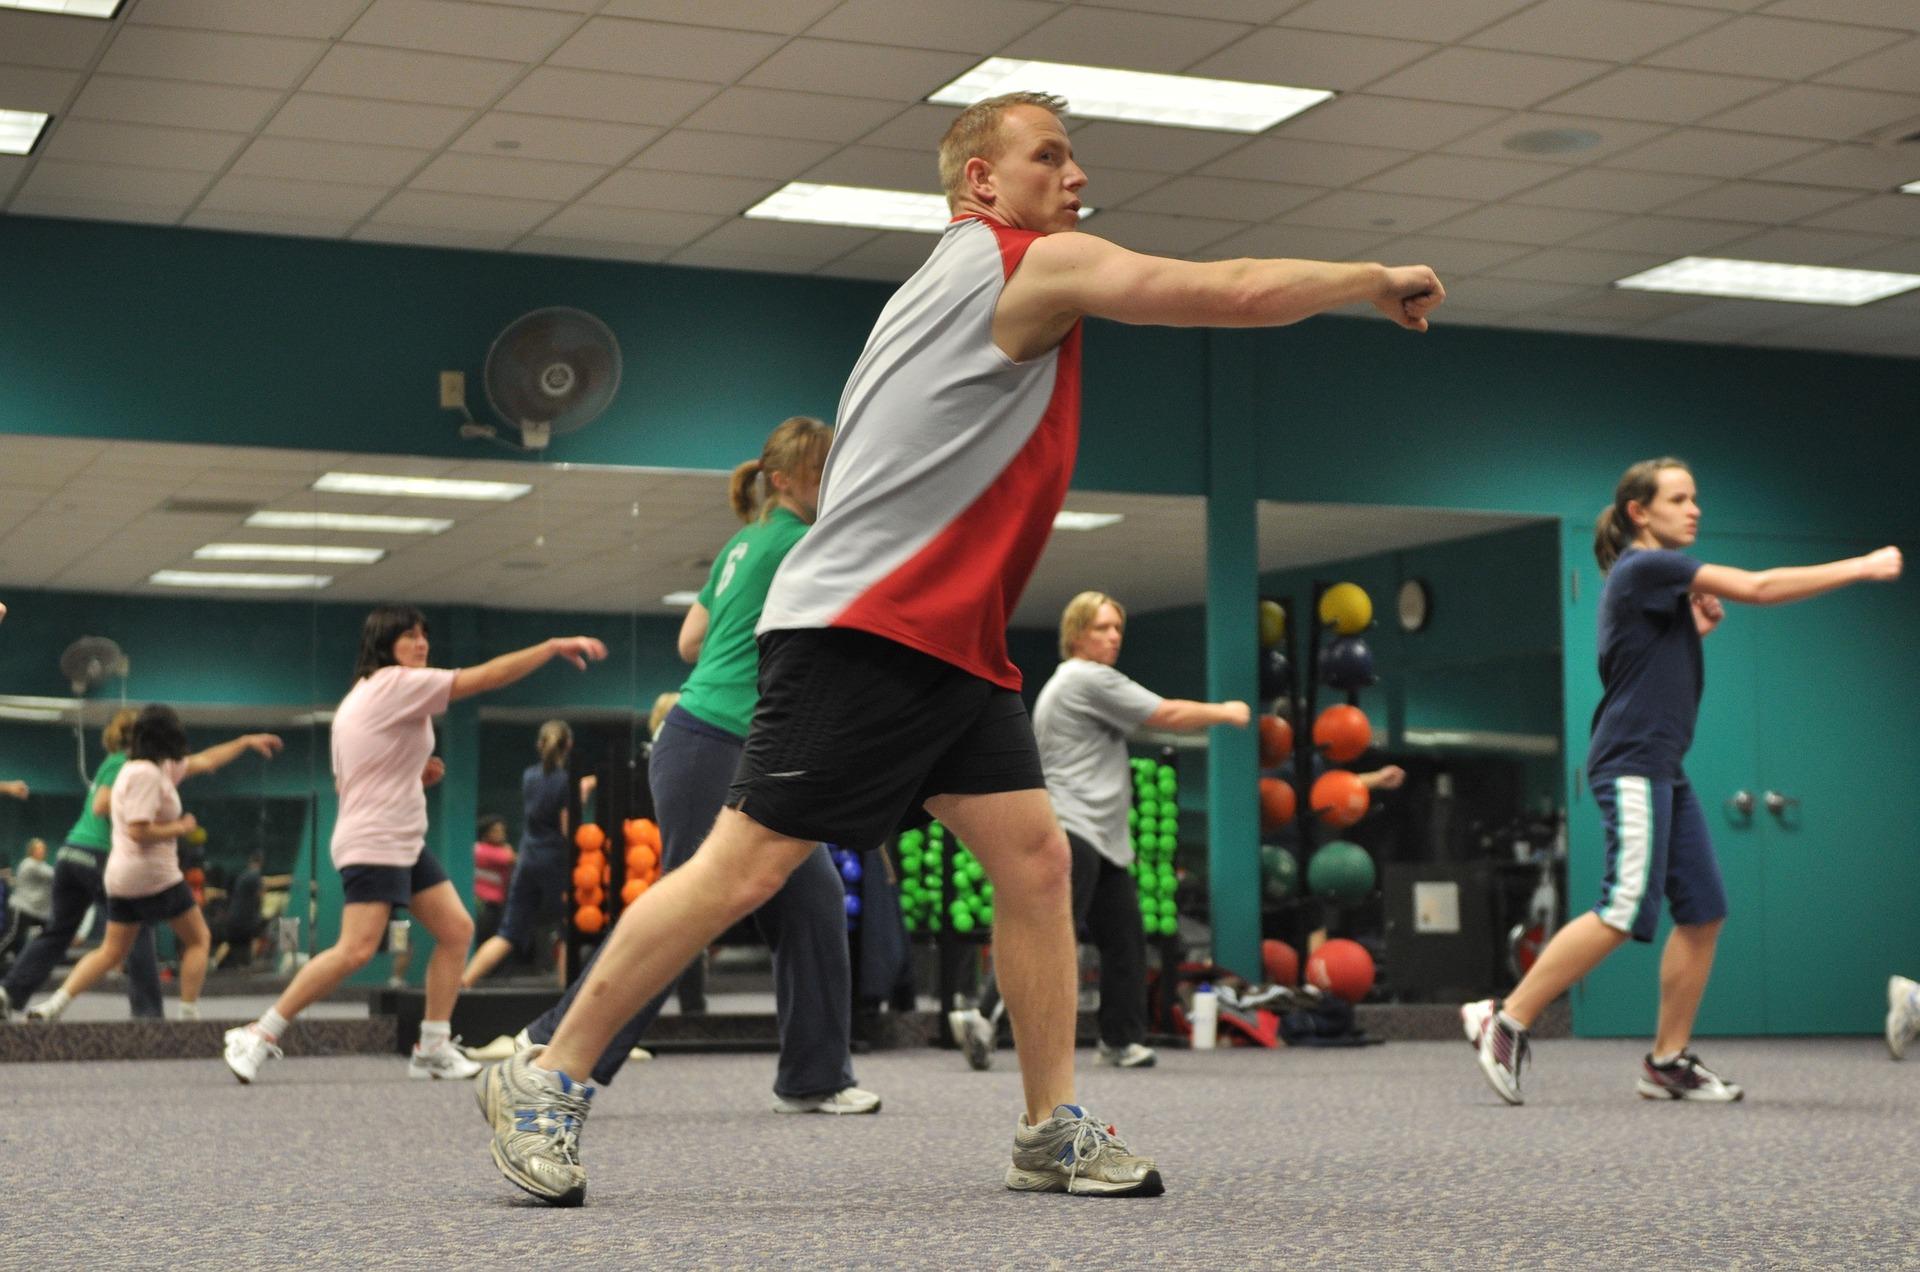 gym-room-1180062_1920